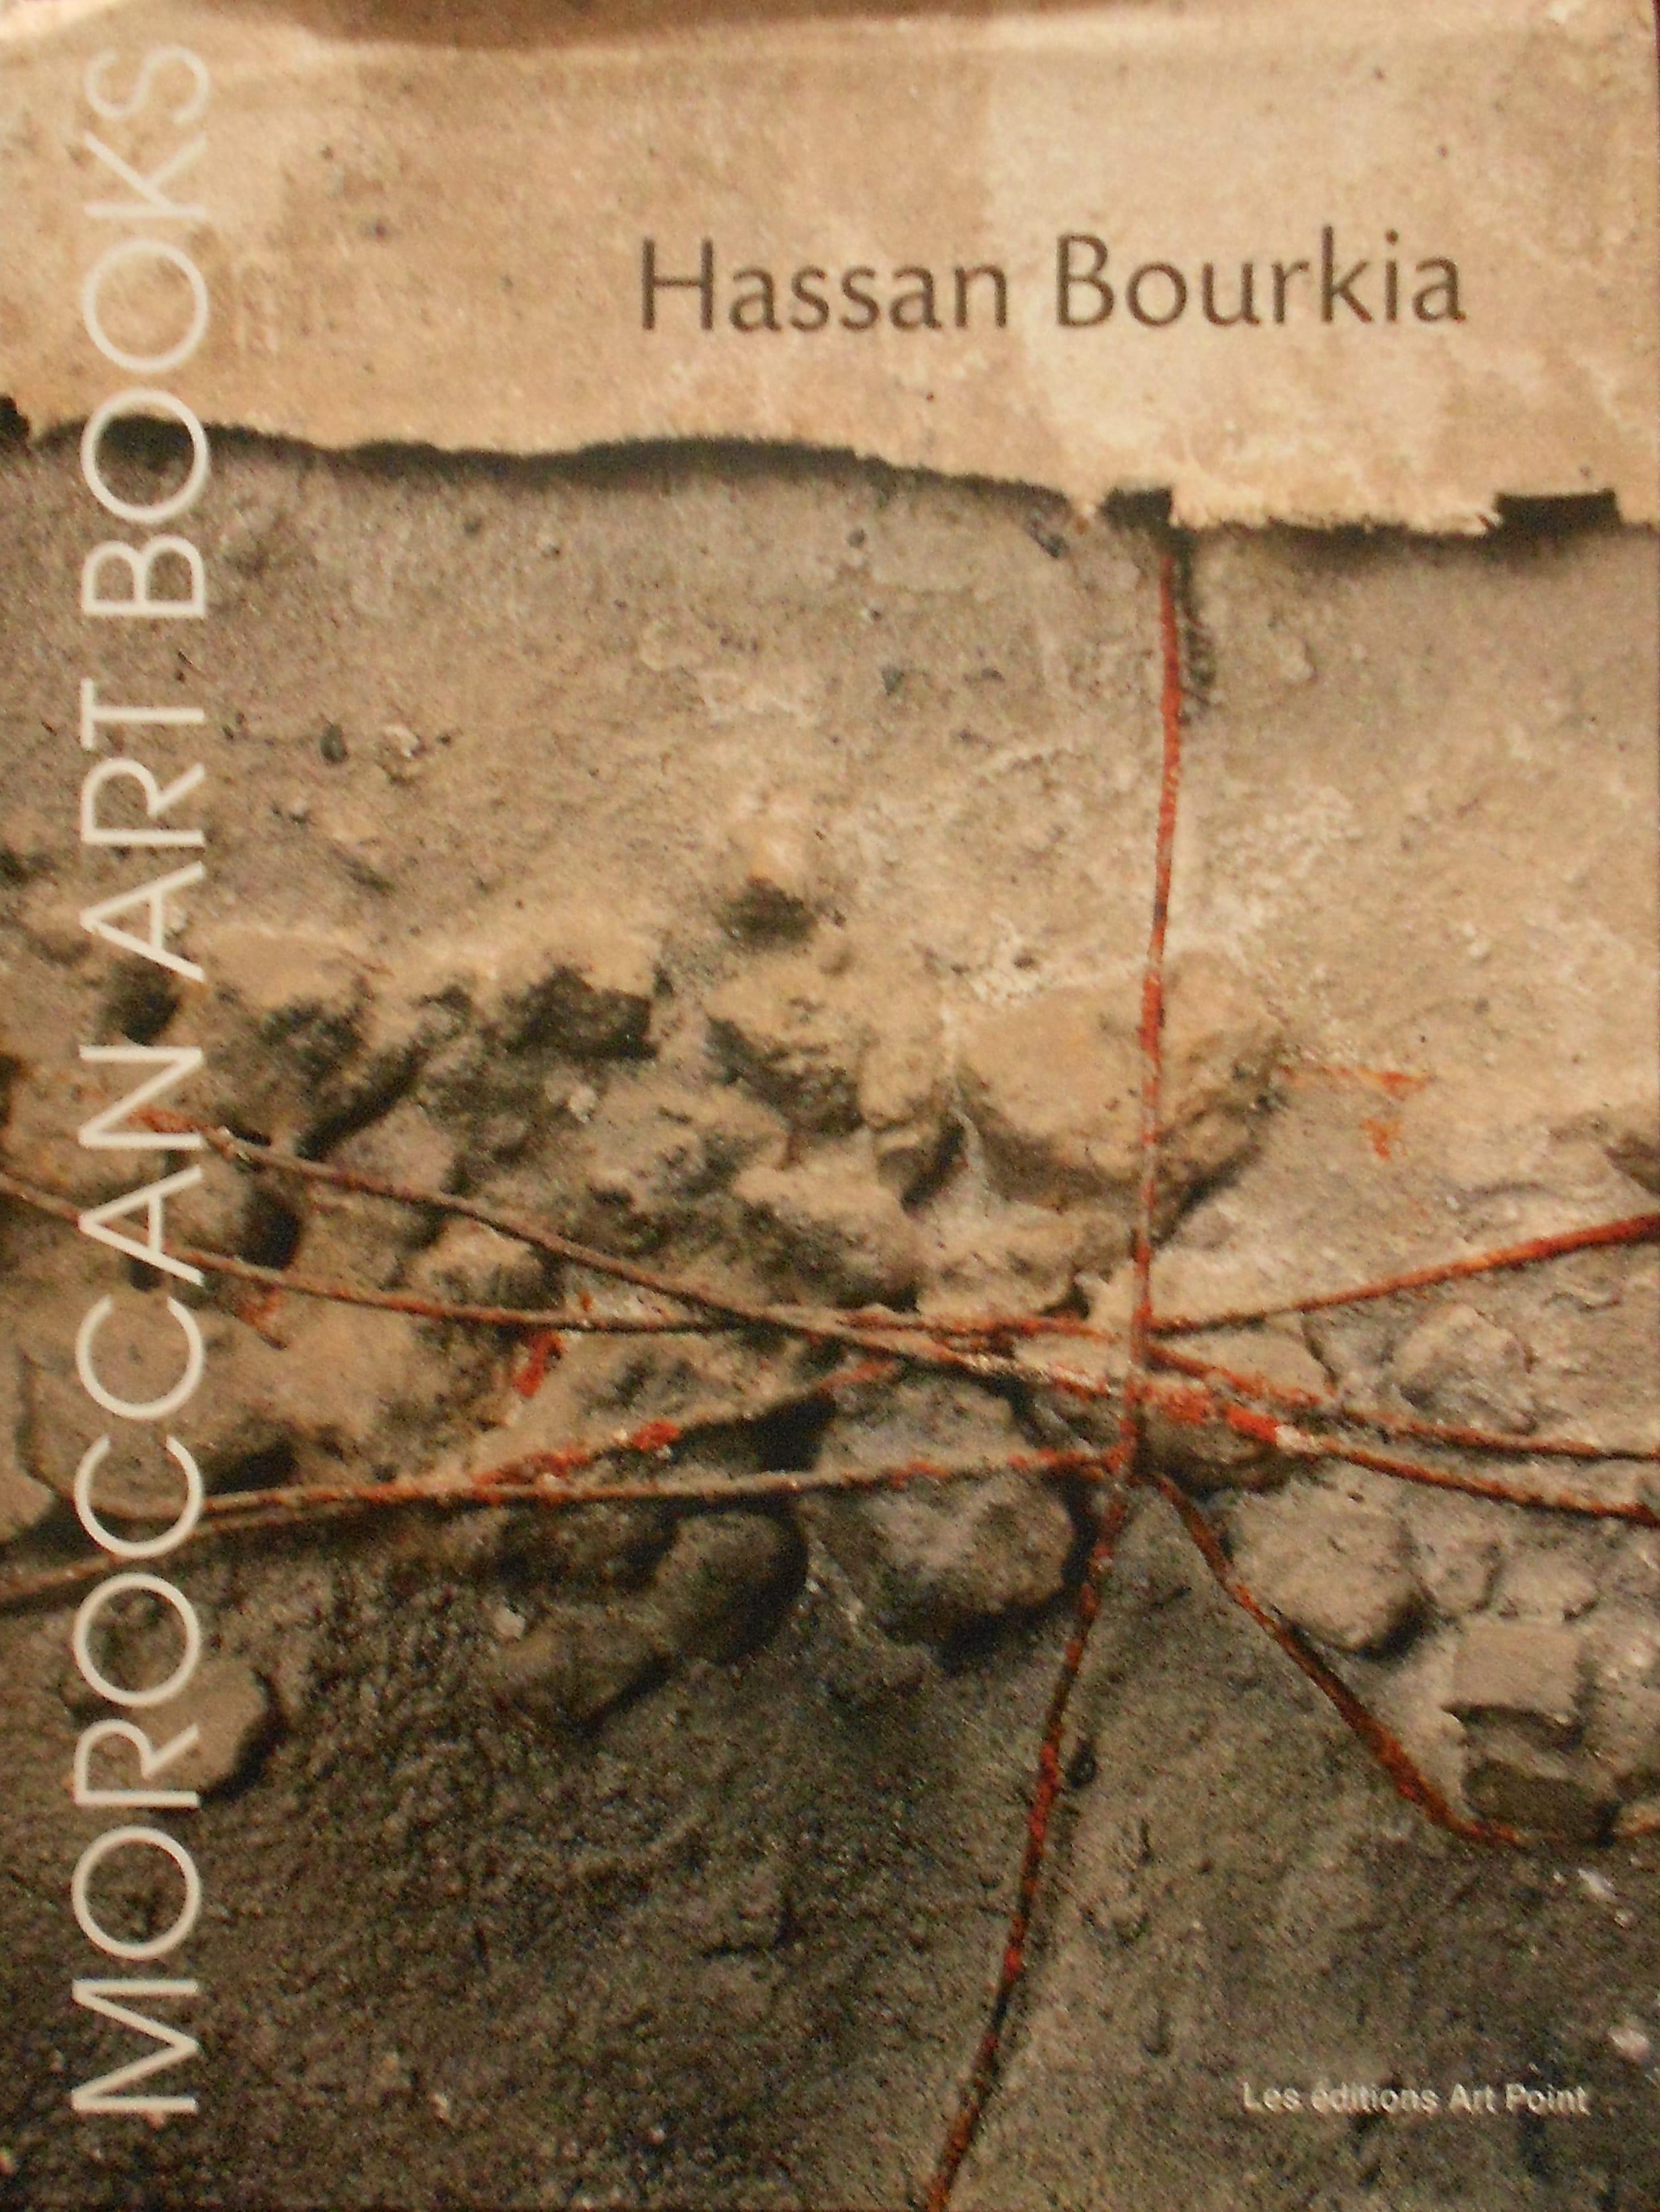 BOURKIA AUX EDITIONS ART POINT